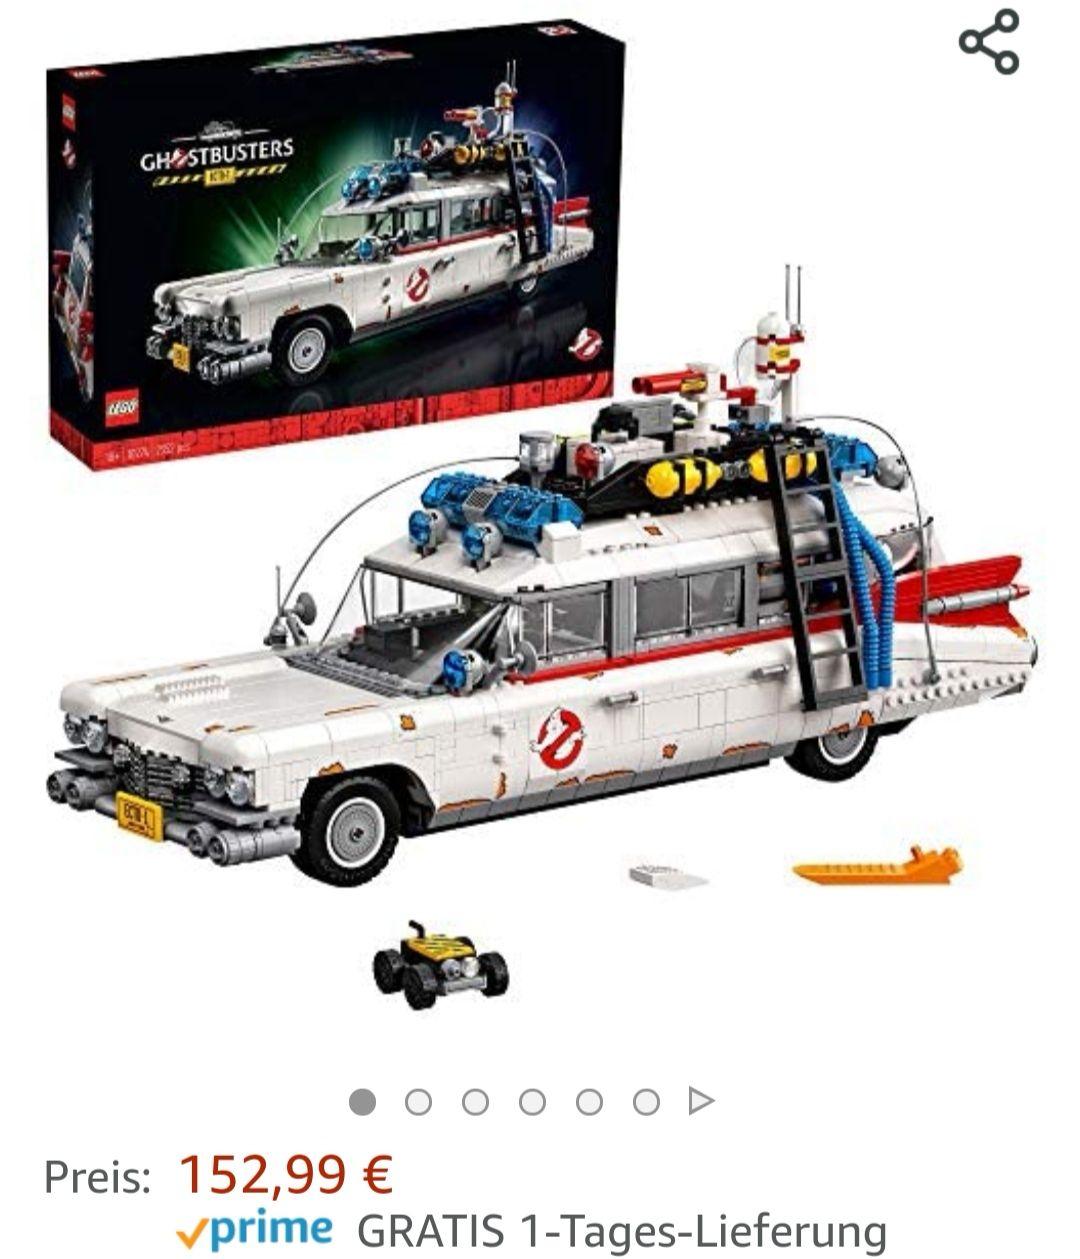 LEGO 10274 Creator Expert Ghostbusters ECTO-1